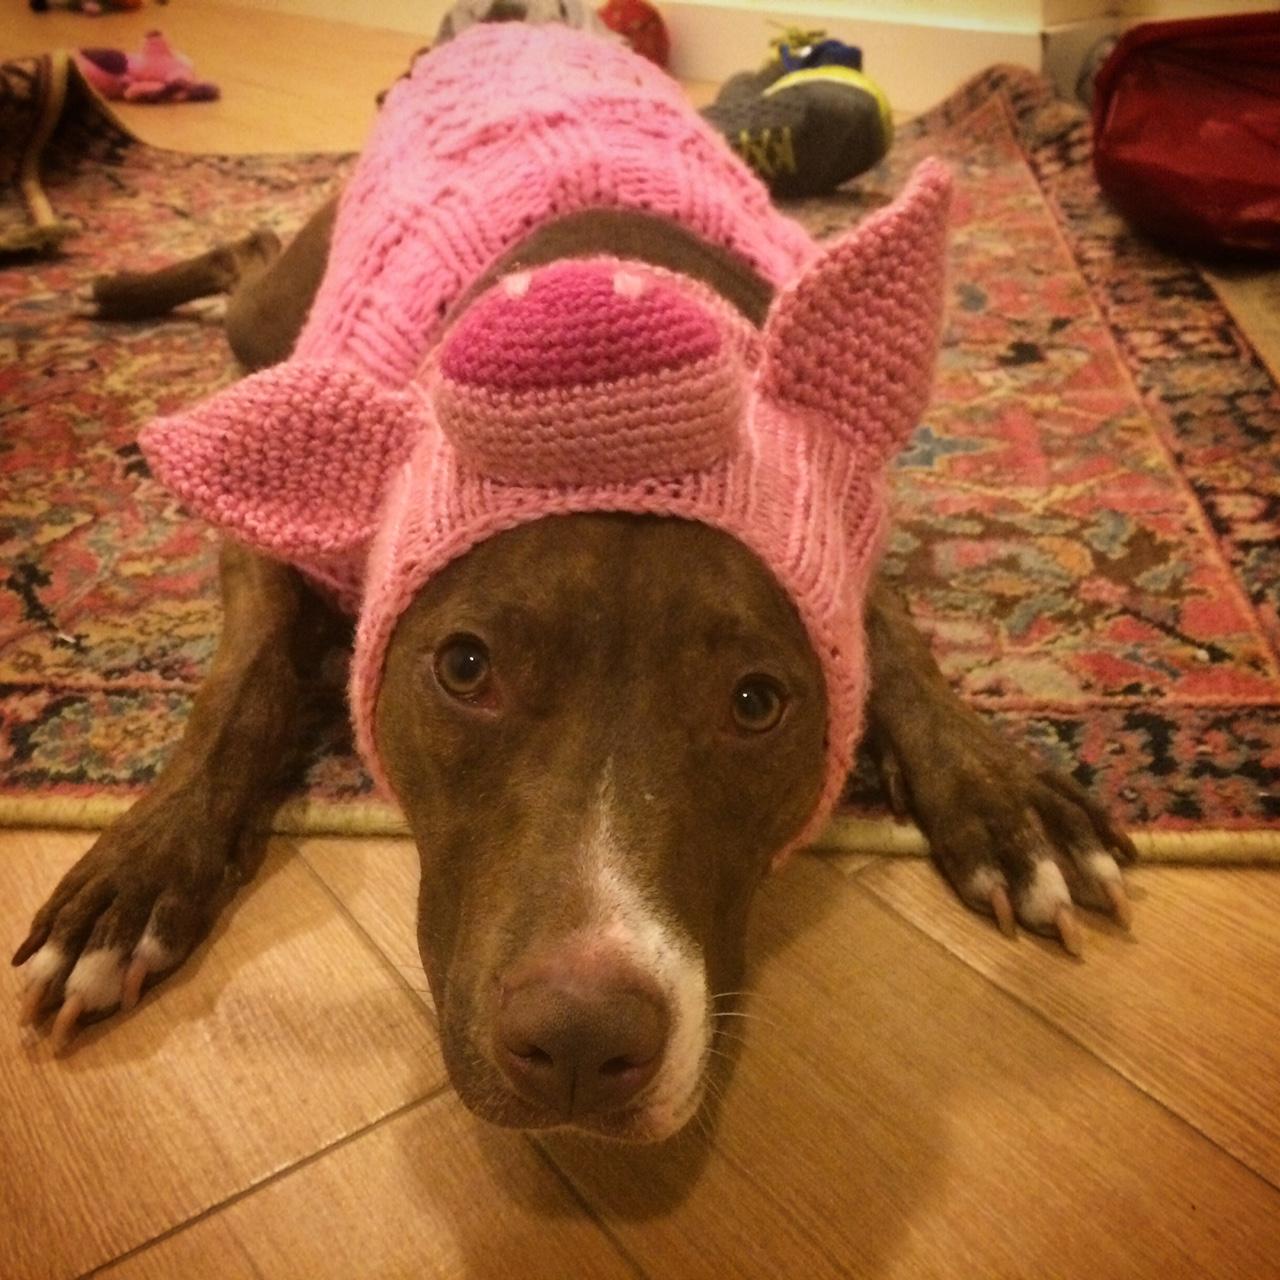 Penelope Pig aka Penny aka Penelopig aka @pigpenthepittie